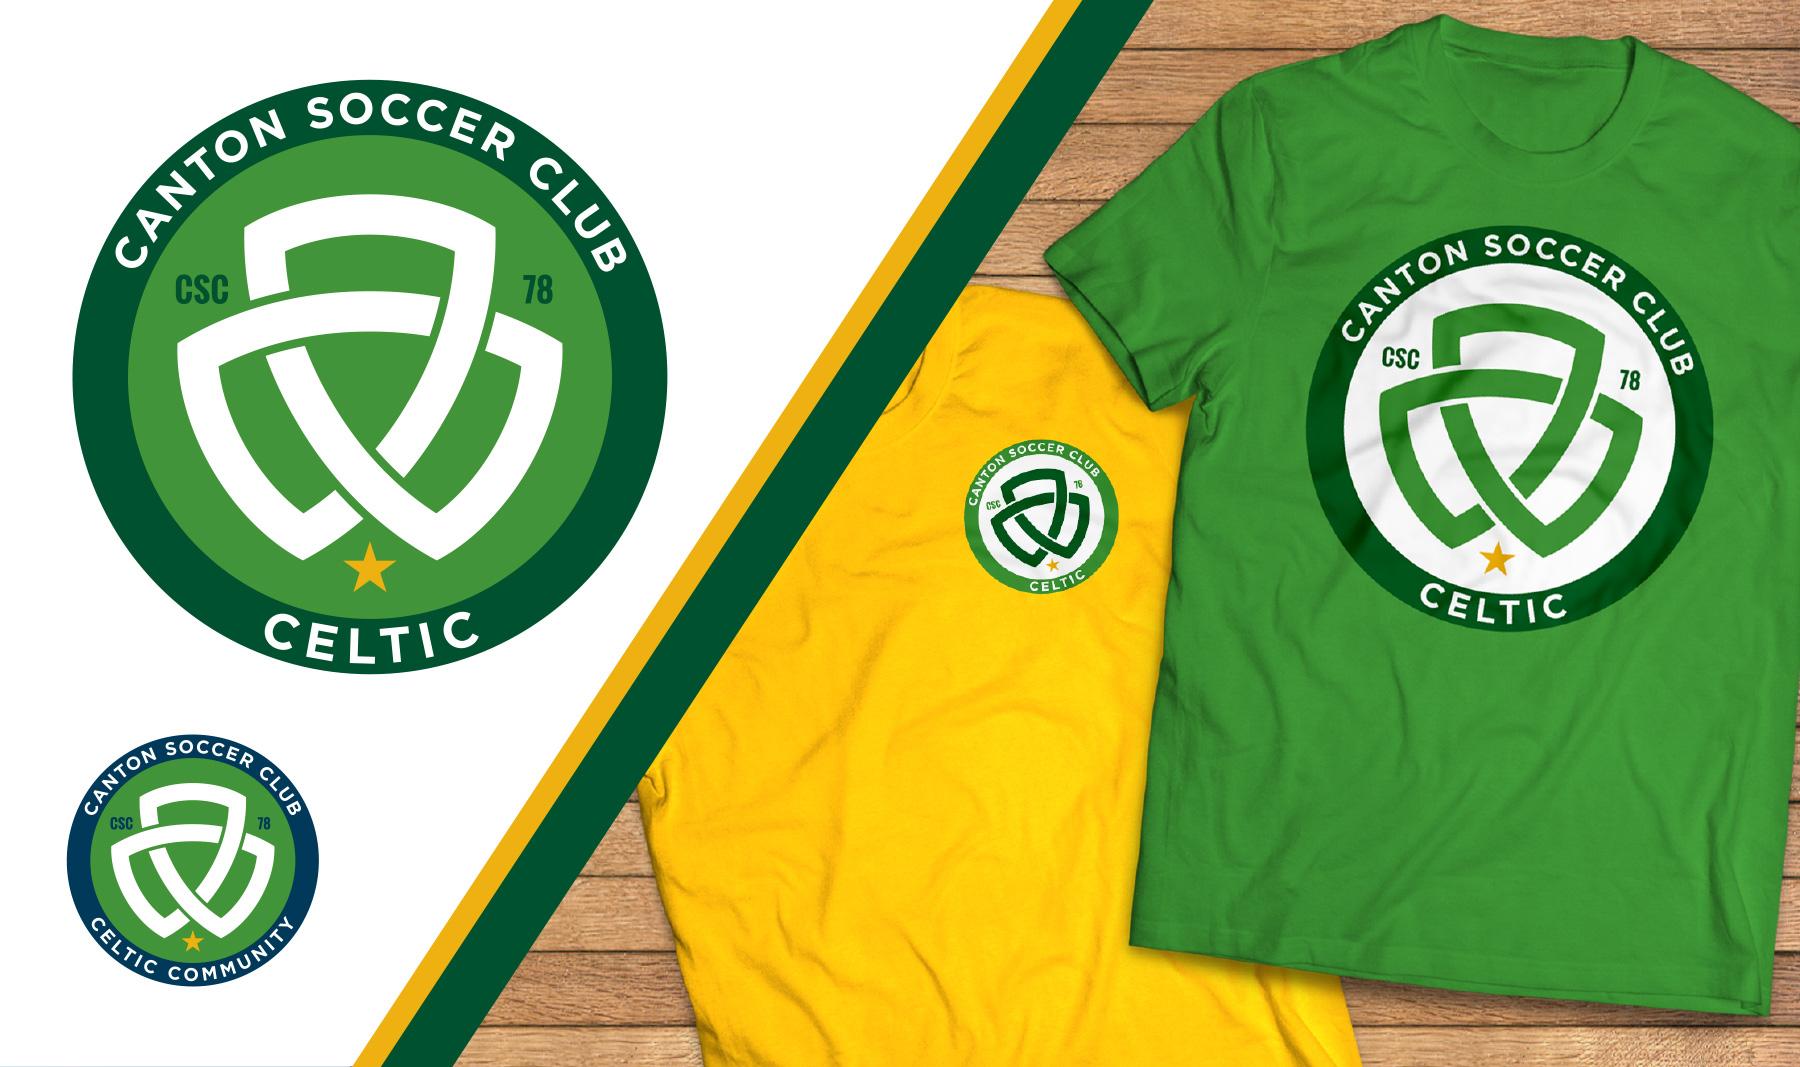 Canton Soccer Club